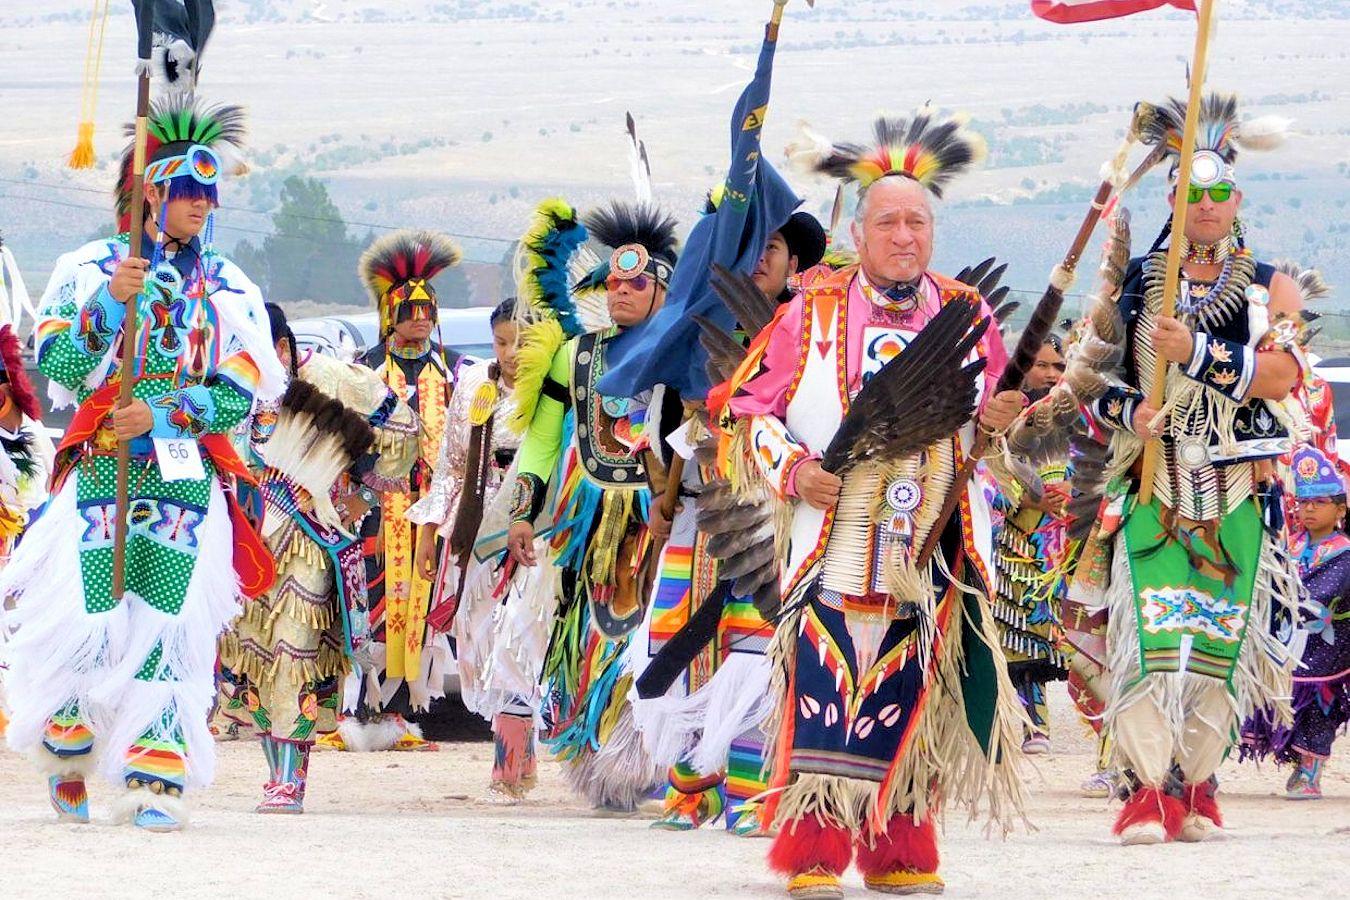 2019 Ely Shoshone Powwow & Fandango | Ely Shoshone Tribe